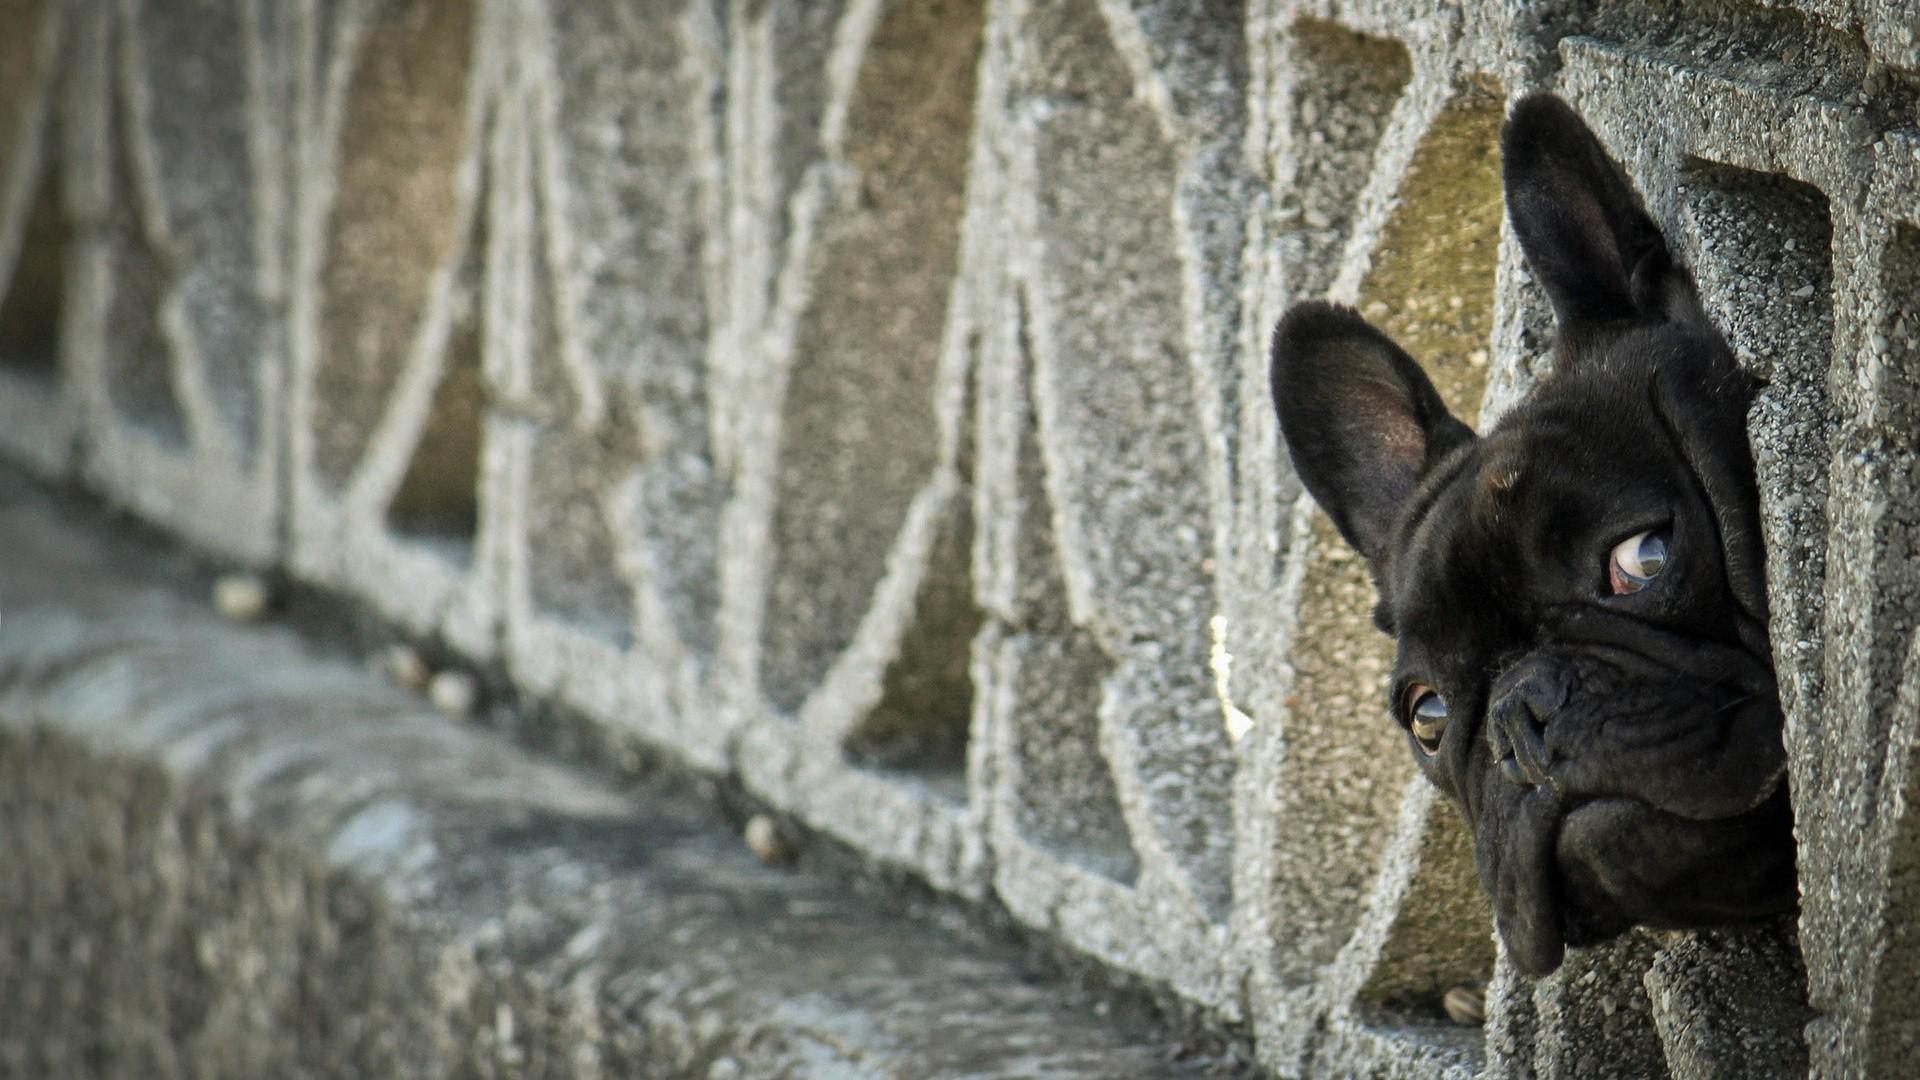 French Bulldog Wallpaper Picture hd